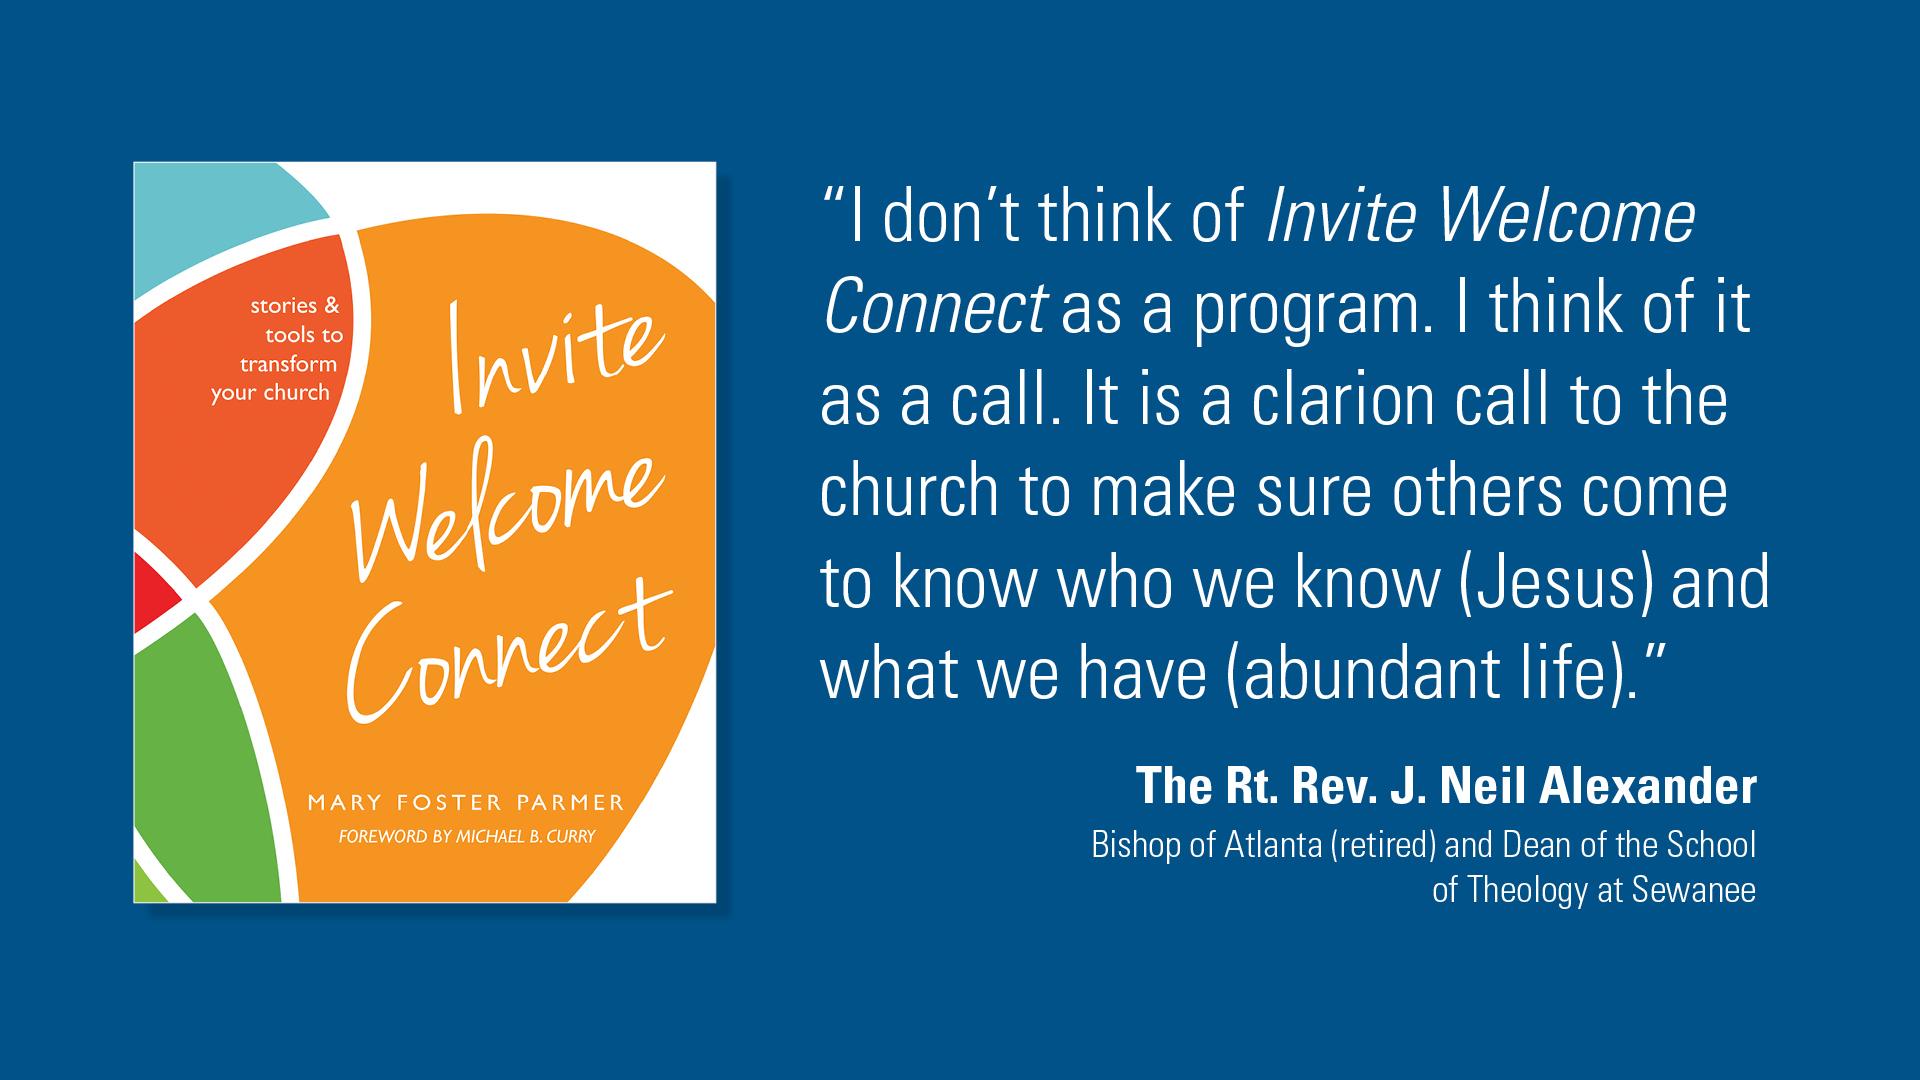 InviteWelcomeConnect_socialmediapost (2).jpg